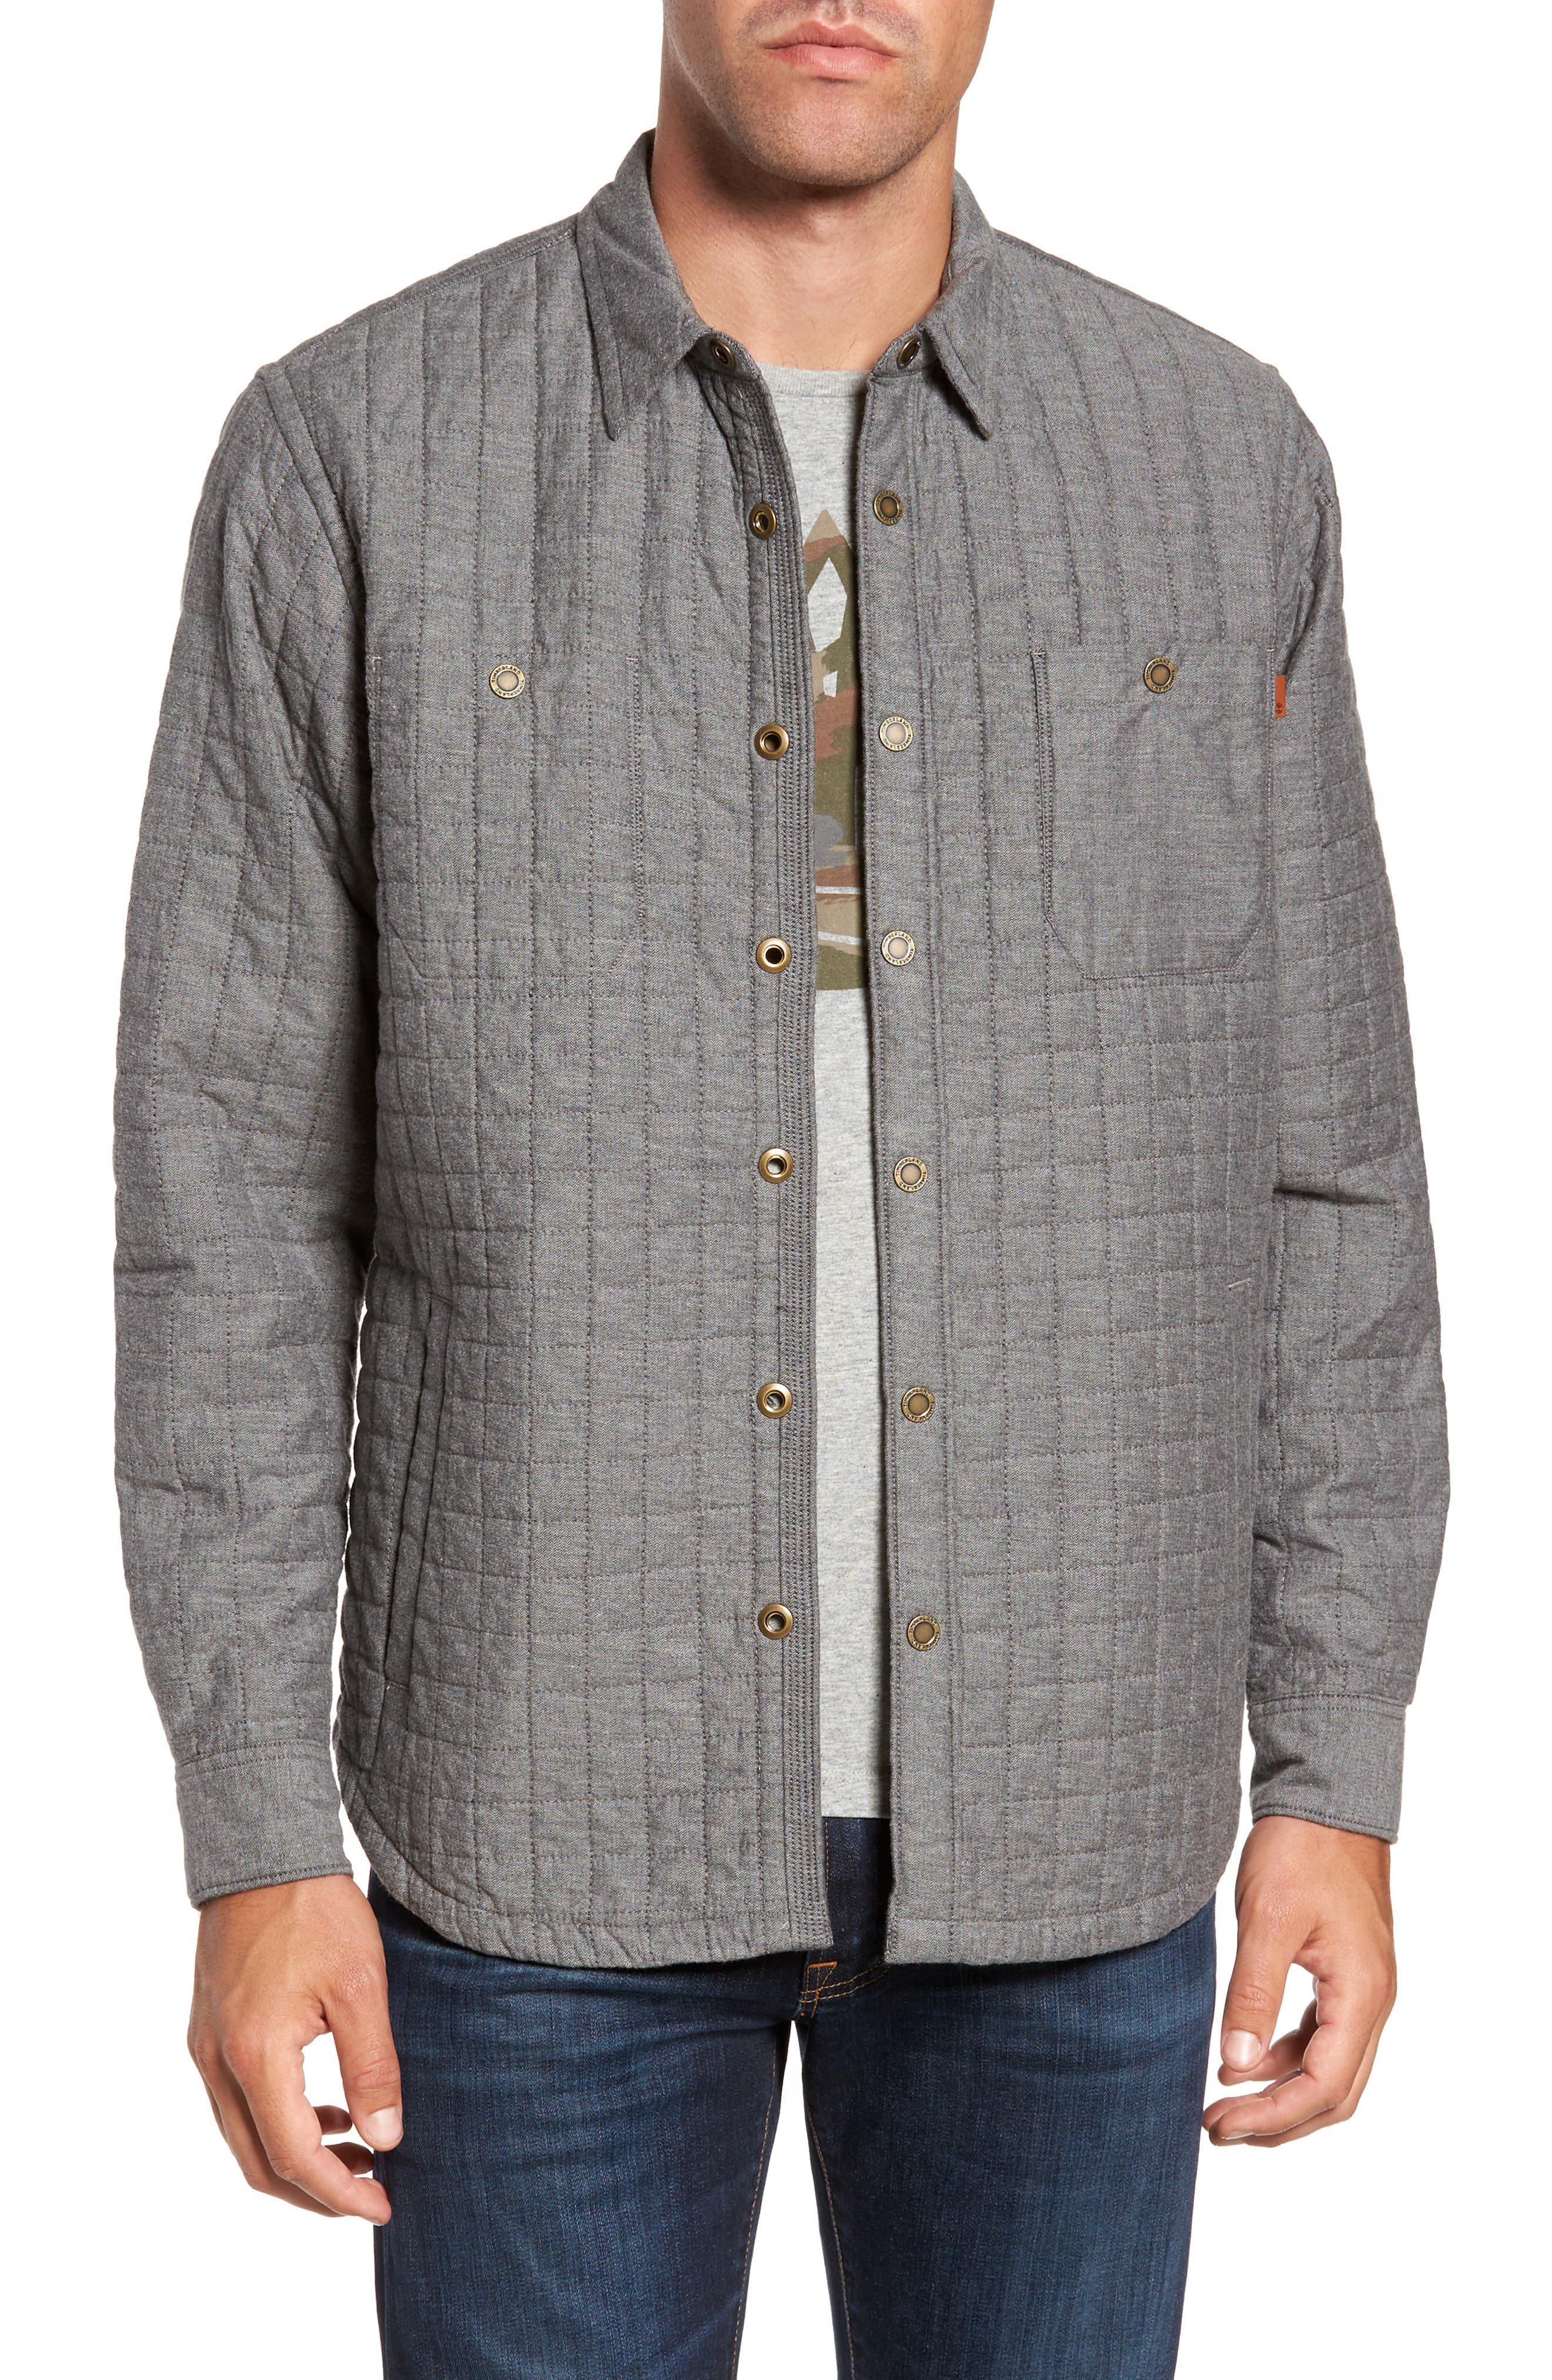 Alternate Image 1 Selected - Timberland Gunstock River Lightweight Quilted Shirt Jacket